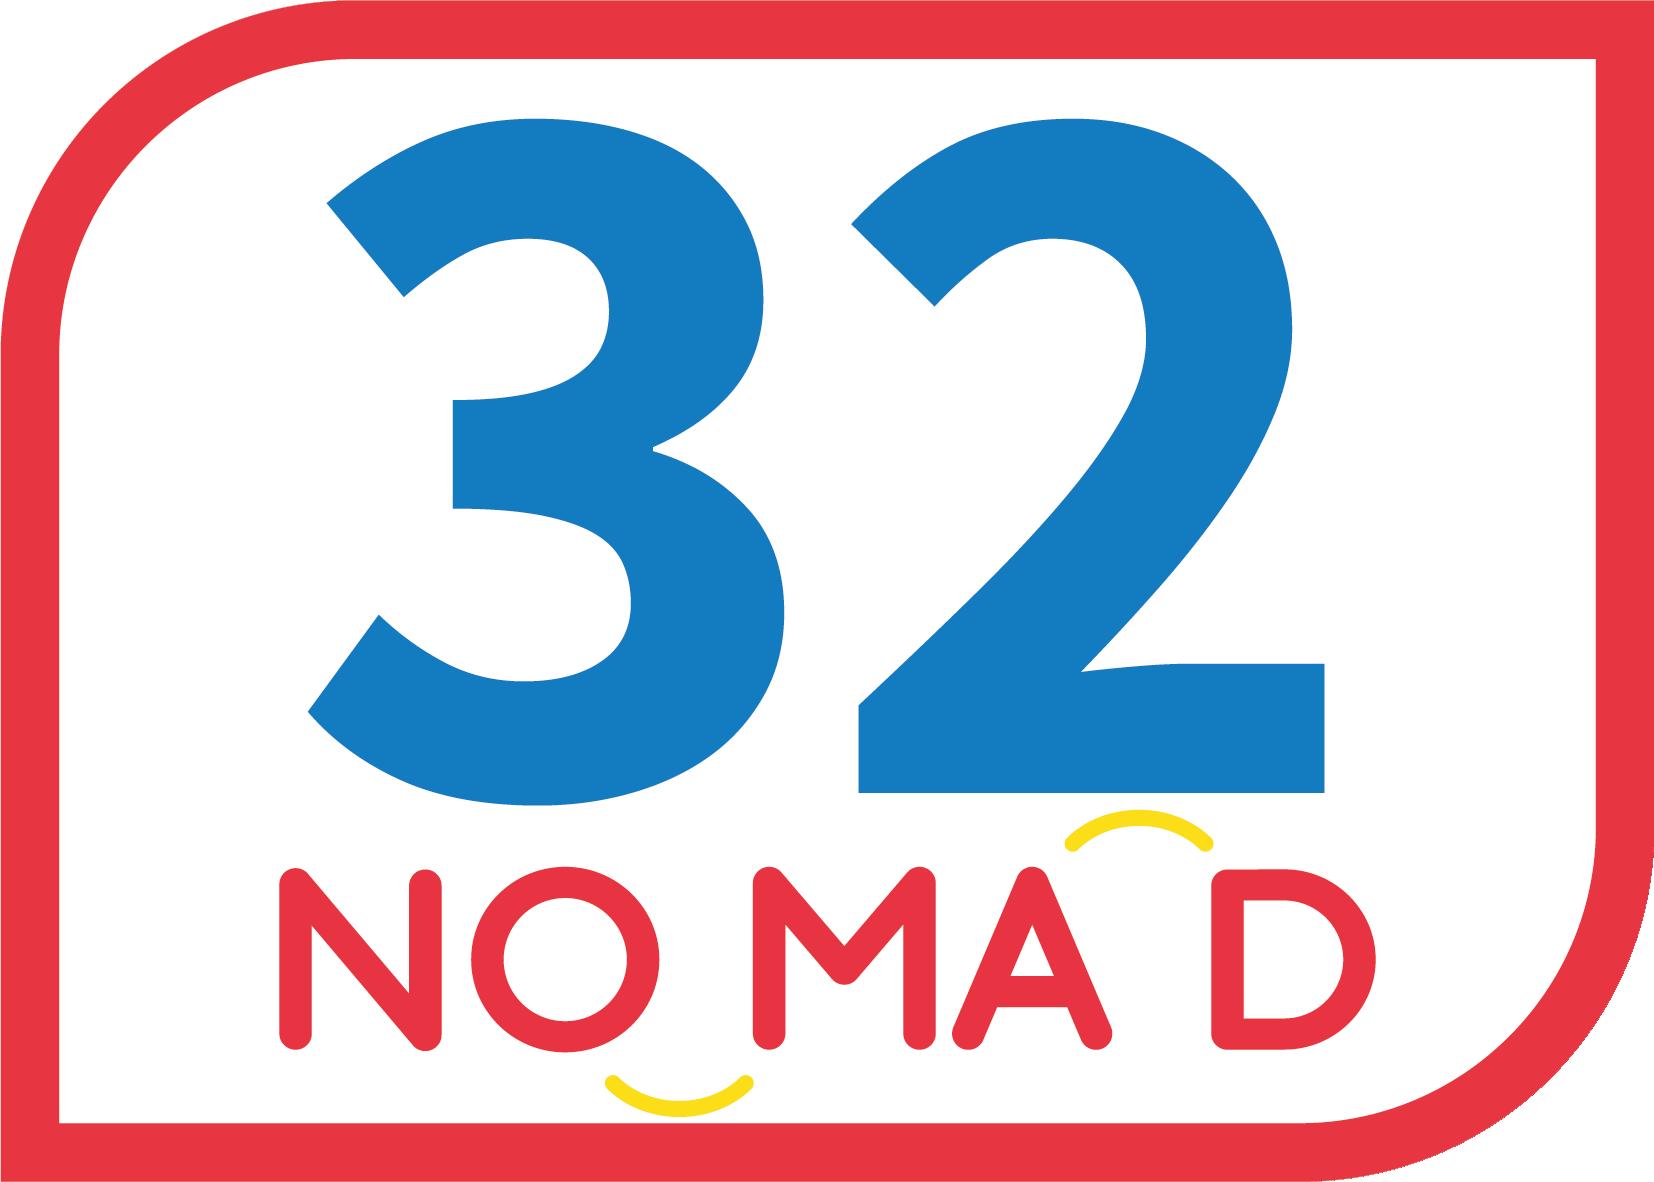 Nomad 32